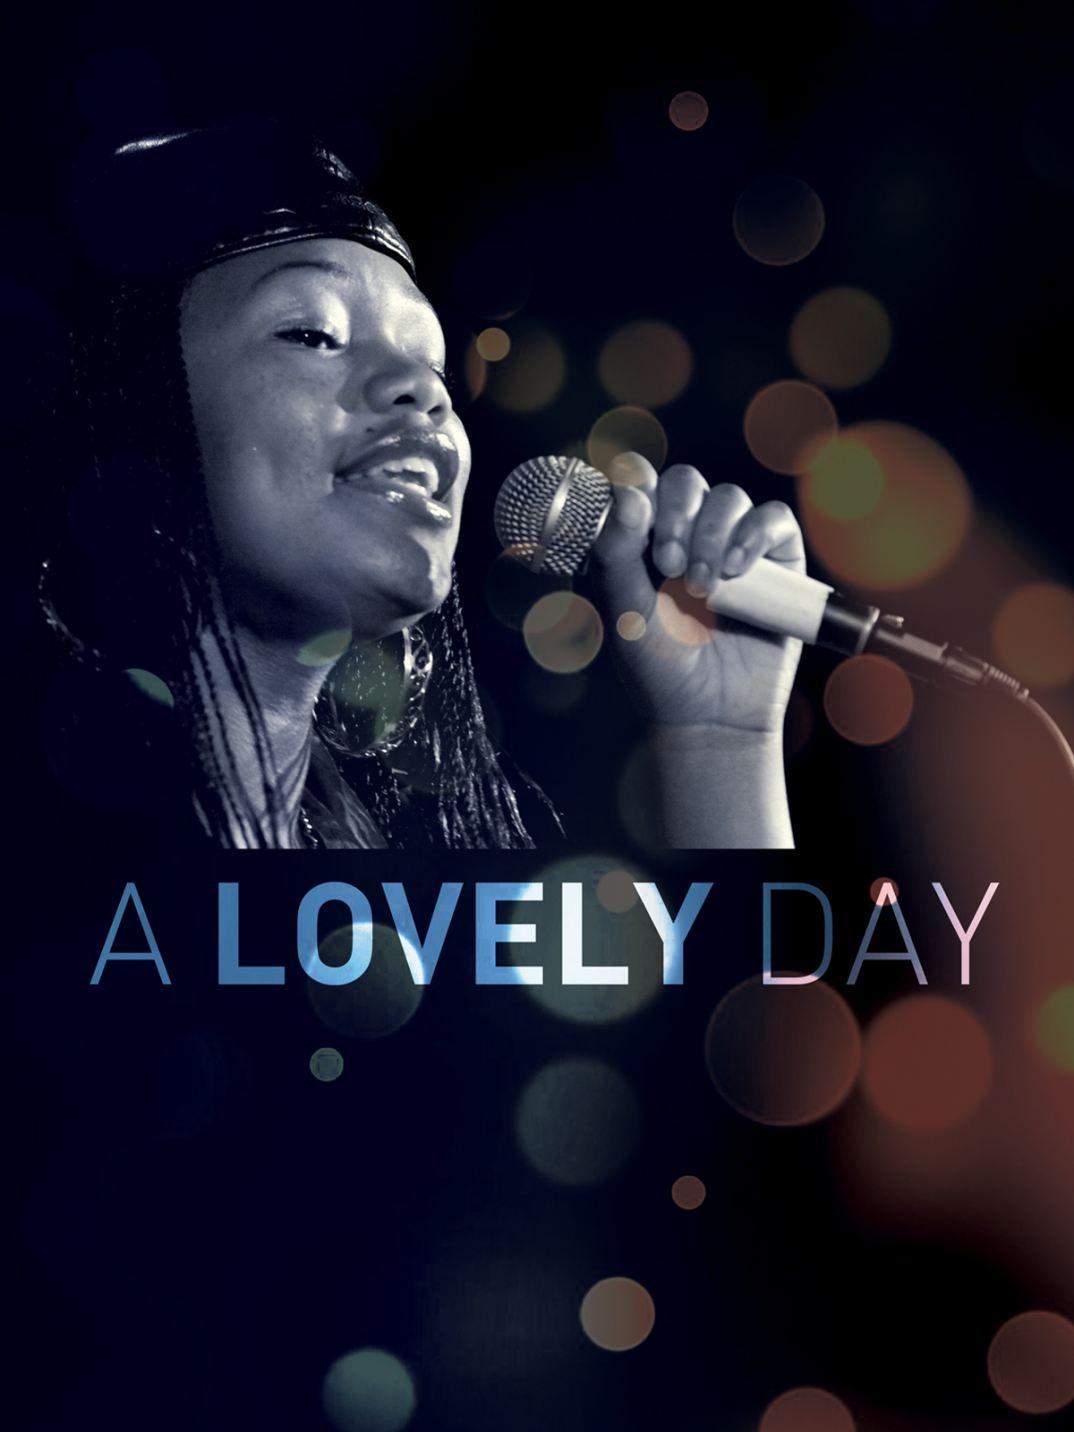 A LOVELY DAY - Beats Rhythm & Life